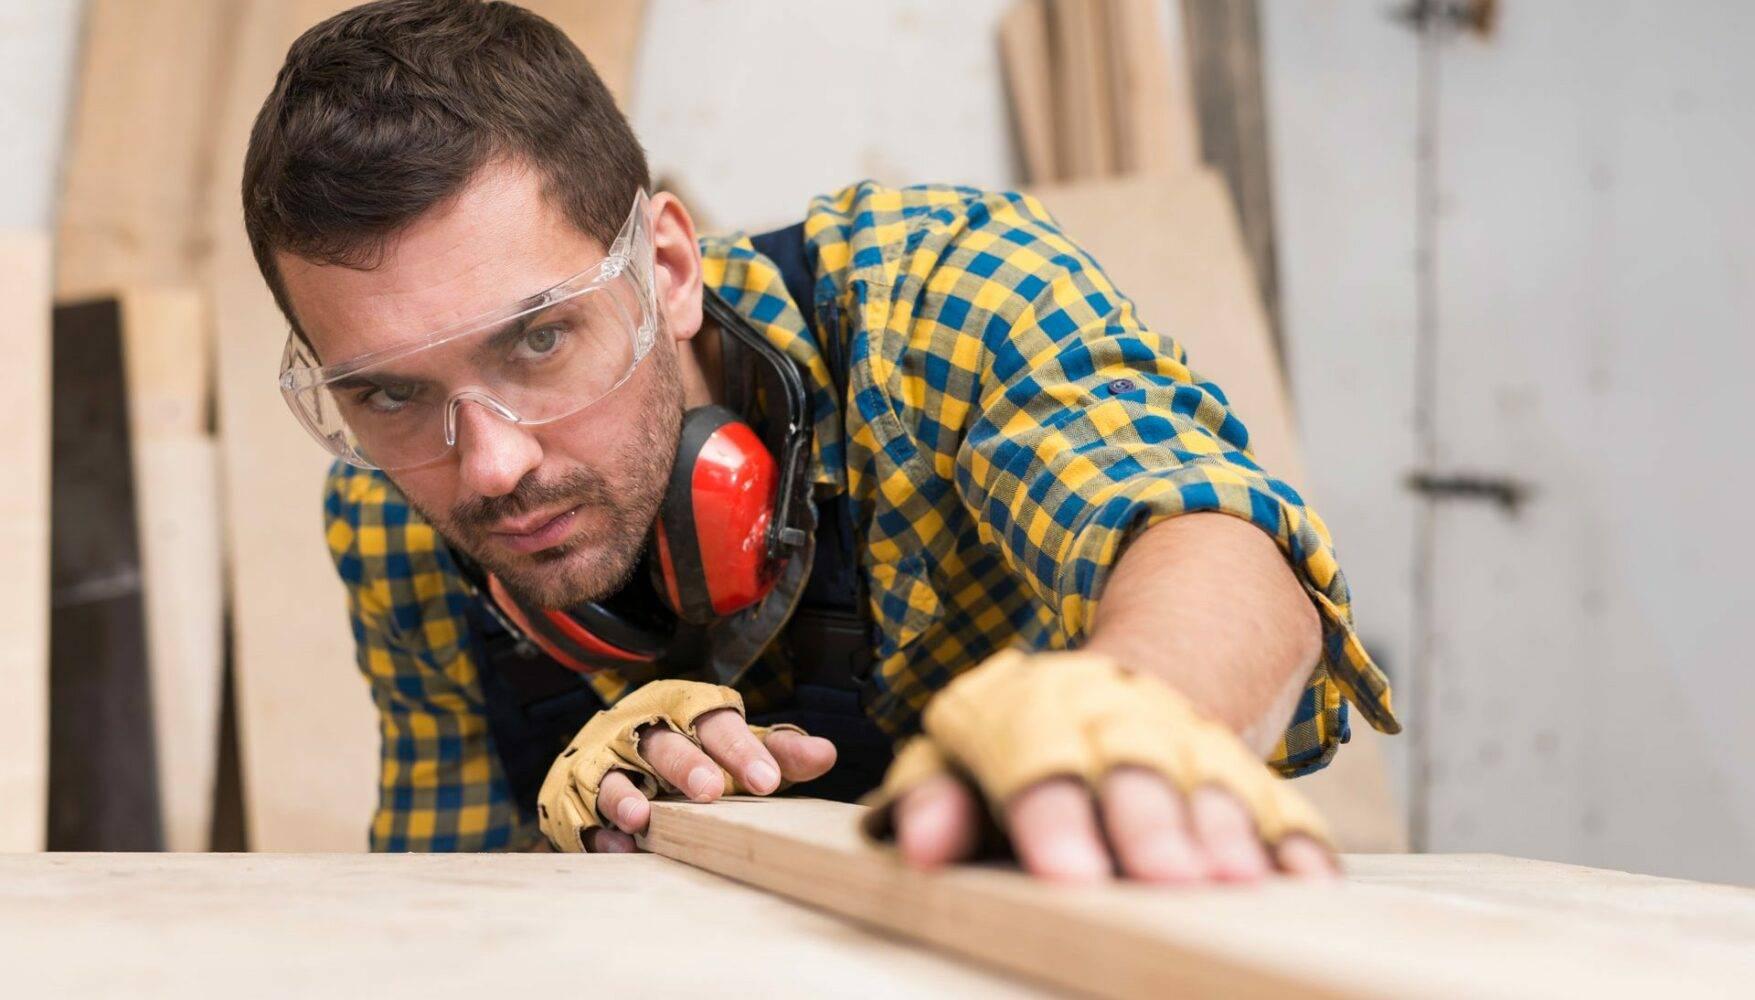 bricolaje-sostenible-herramientas-ferreteria-cartagena-murcia